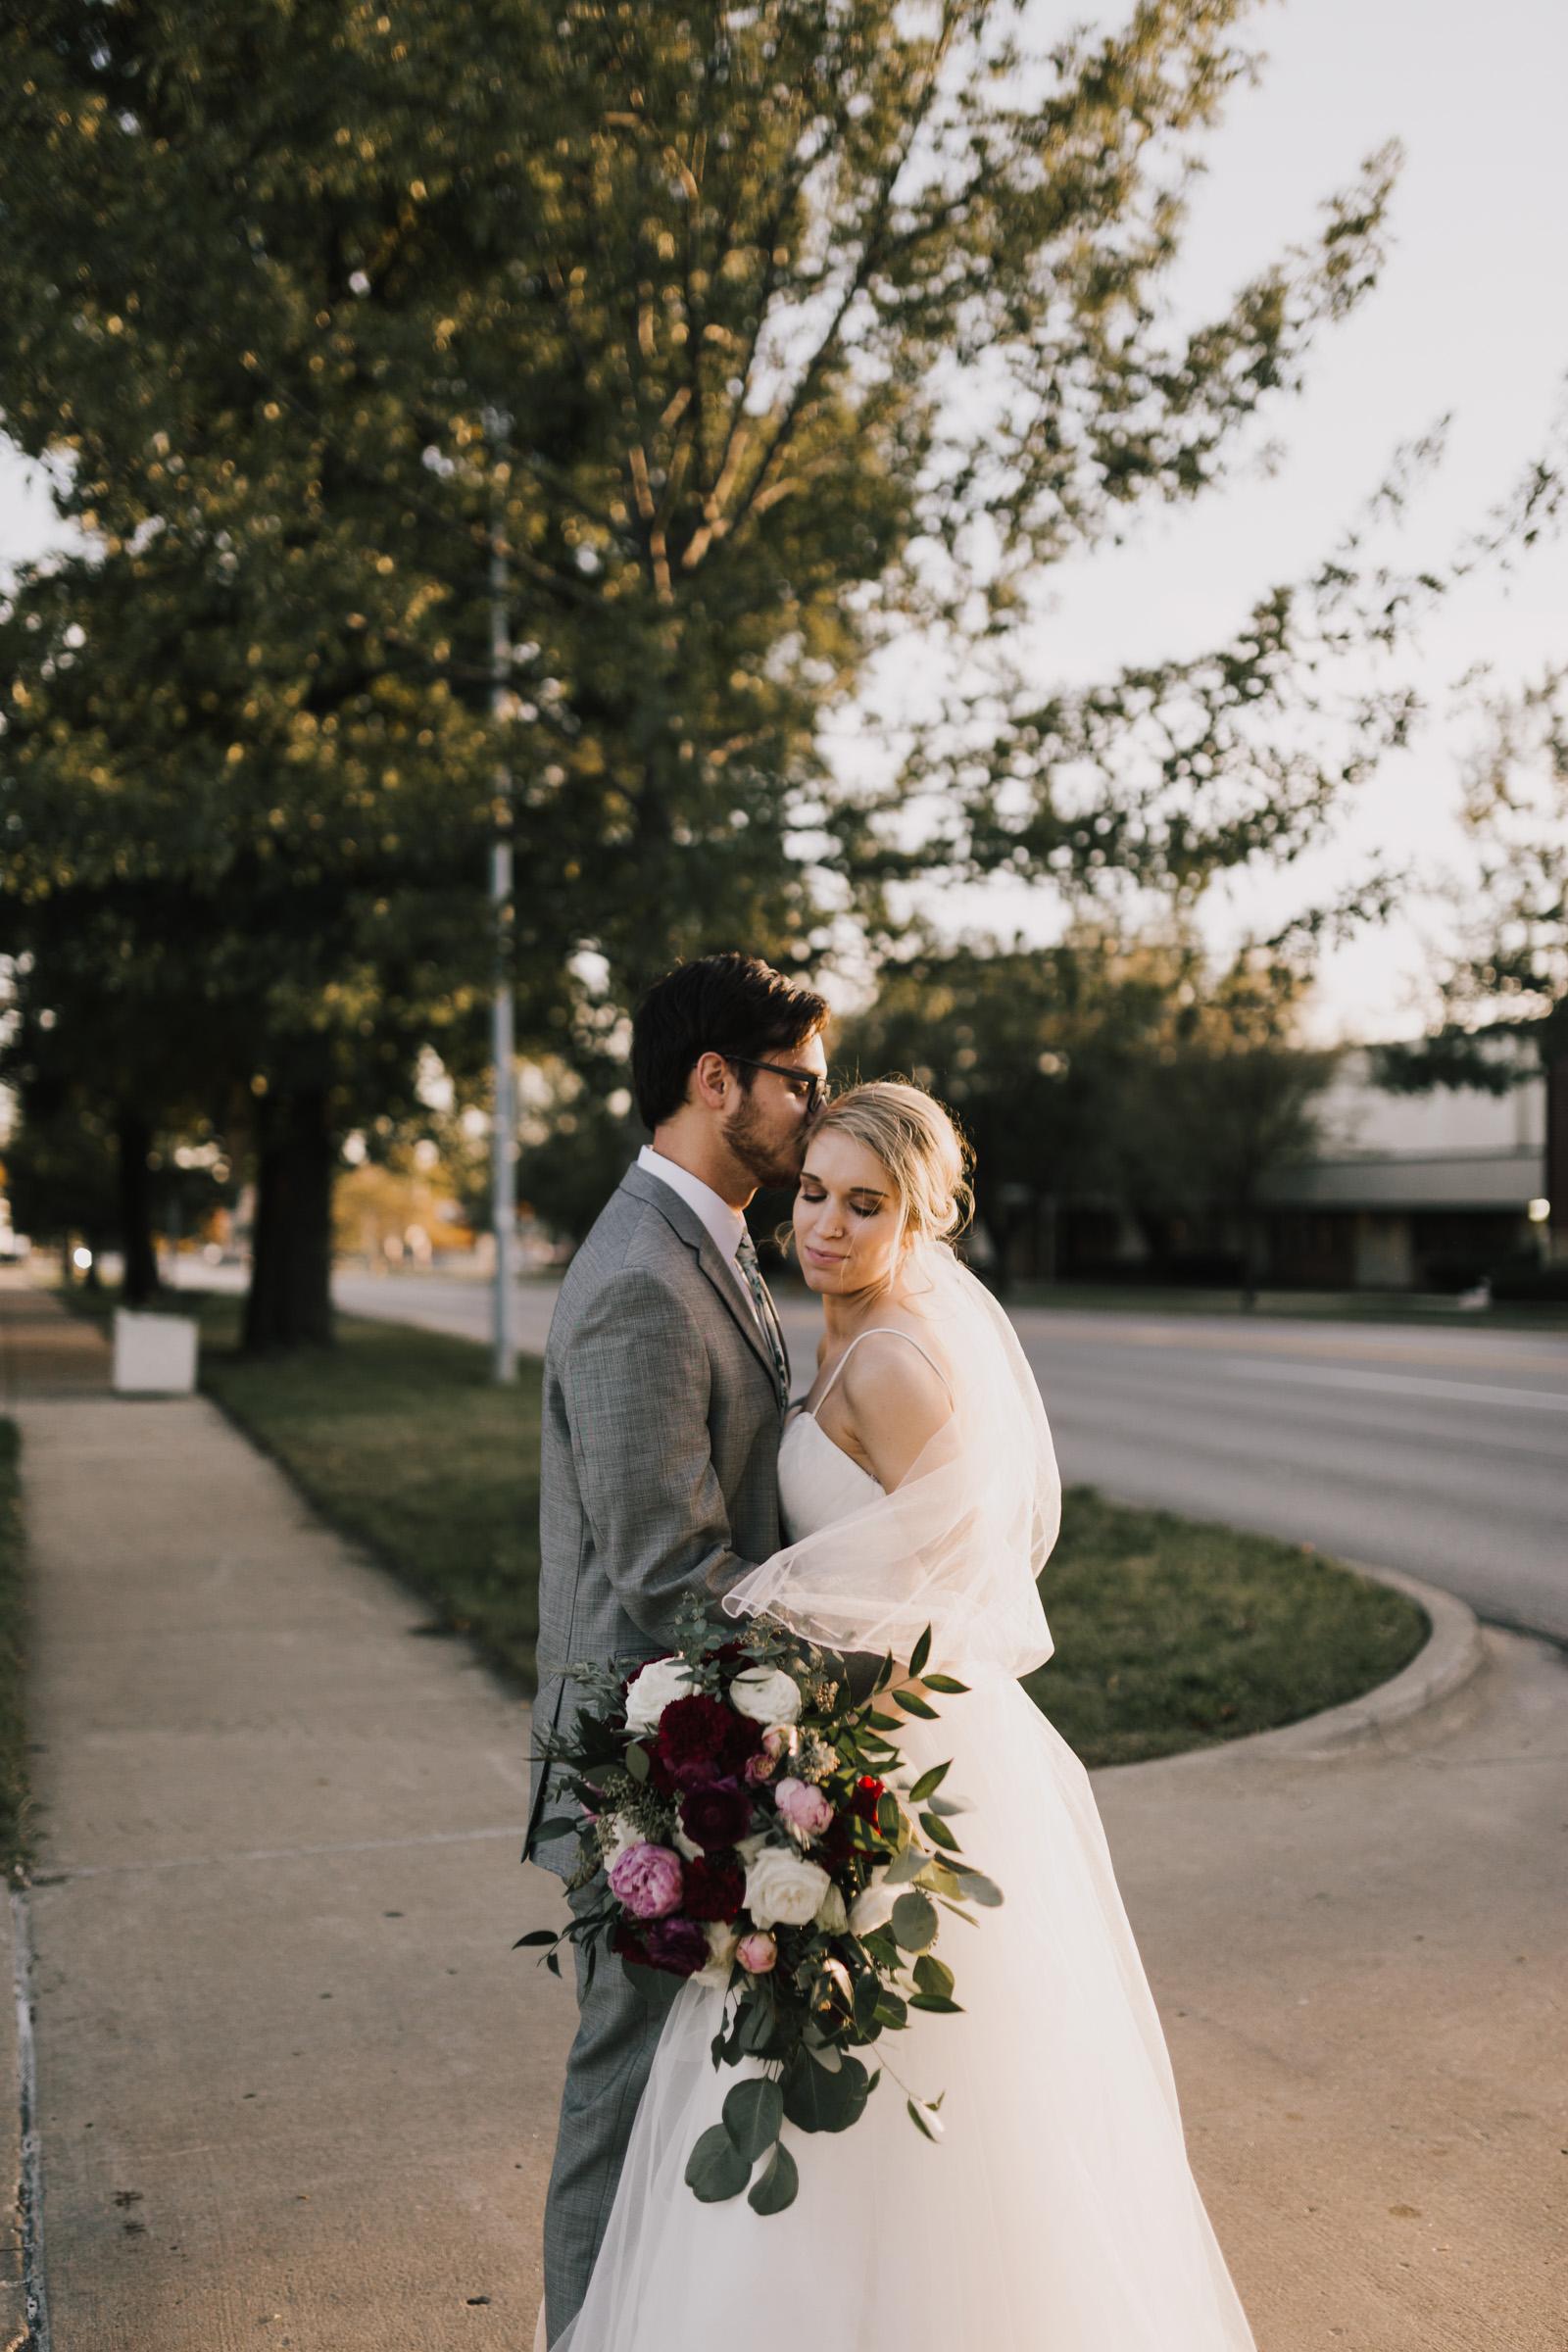 alyssa barletter photography midtown kansas city wedding el torreon kcmo fall october wedding photography-44.jpg